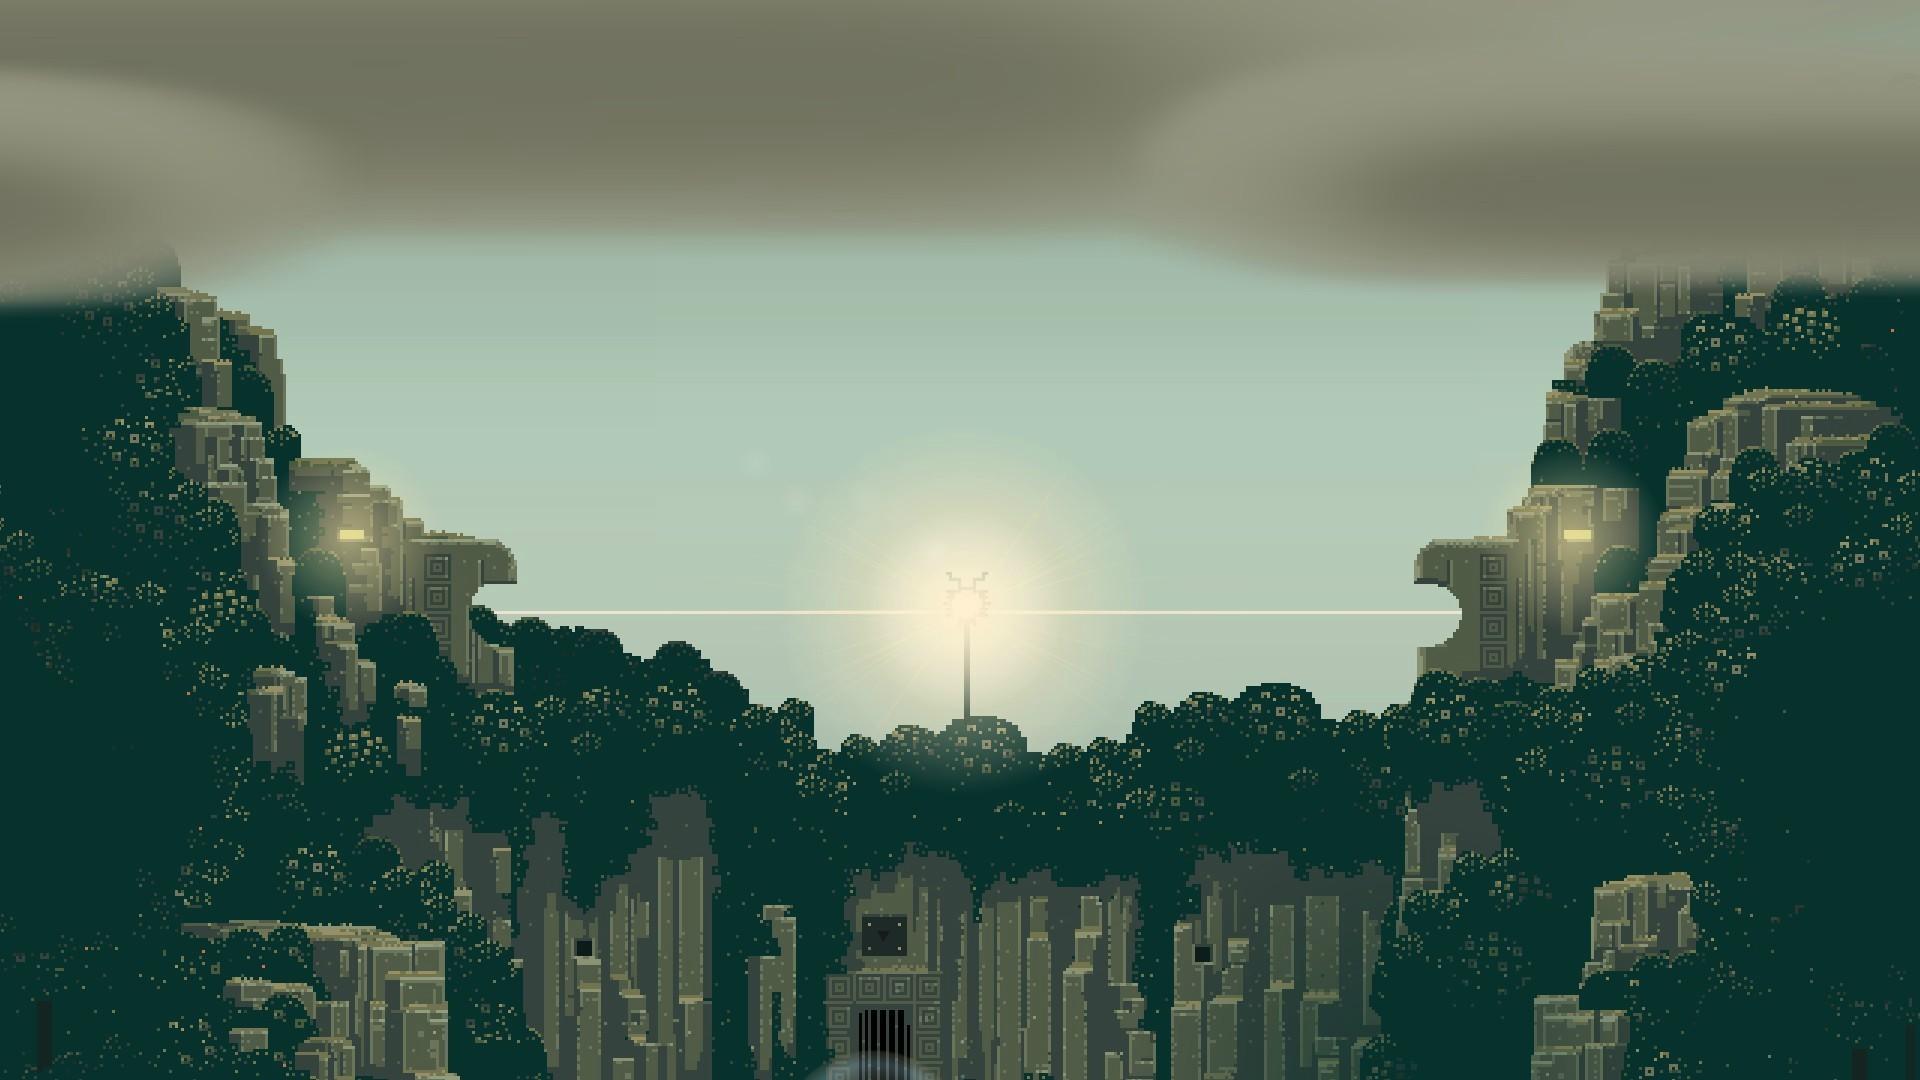 Pixel Art Desktop Backgrounds Posted By Ryan Johnson